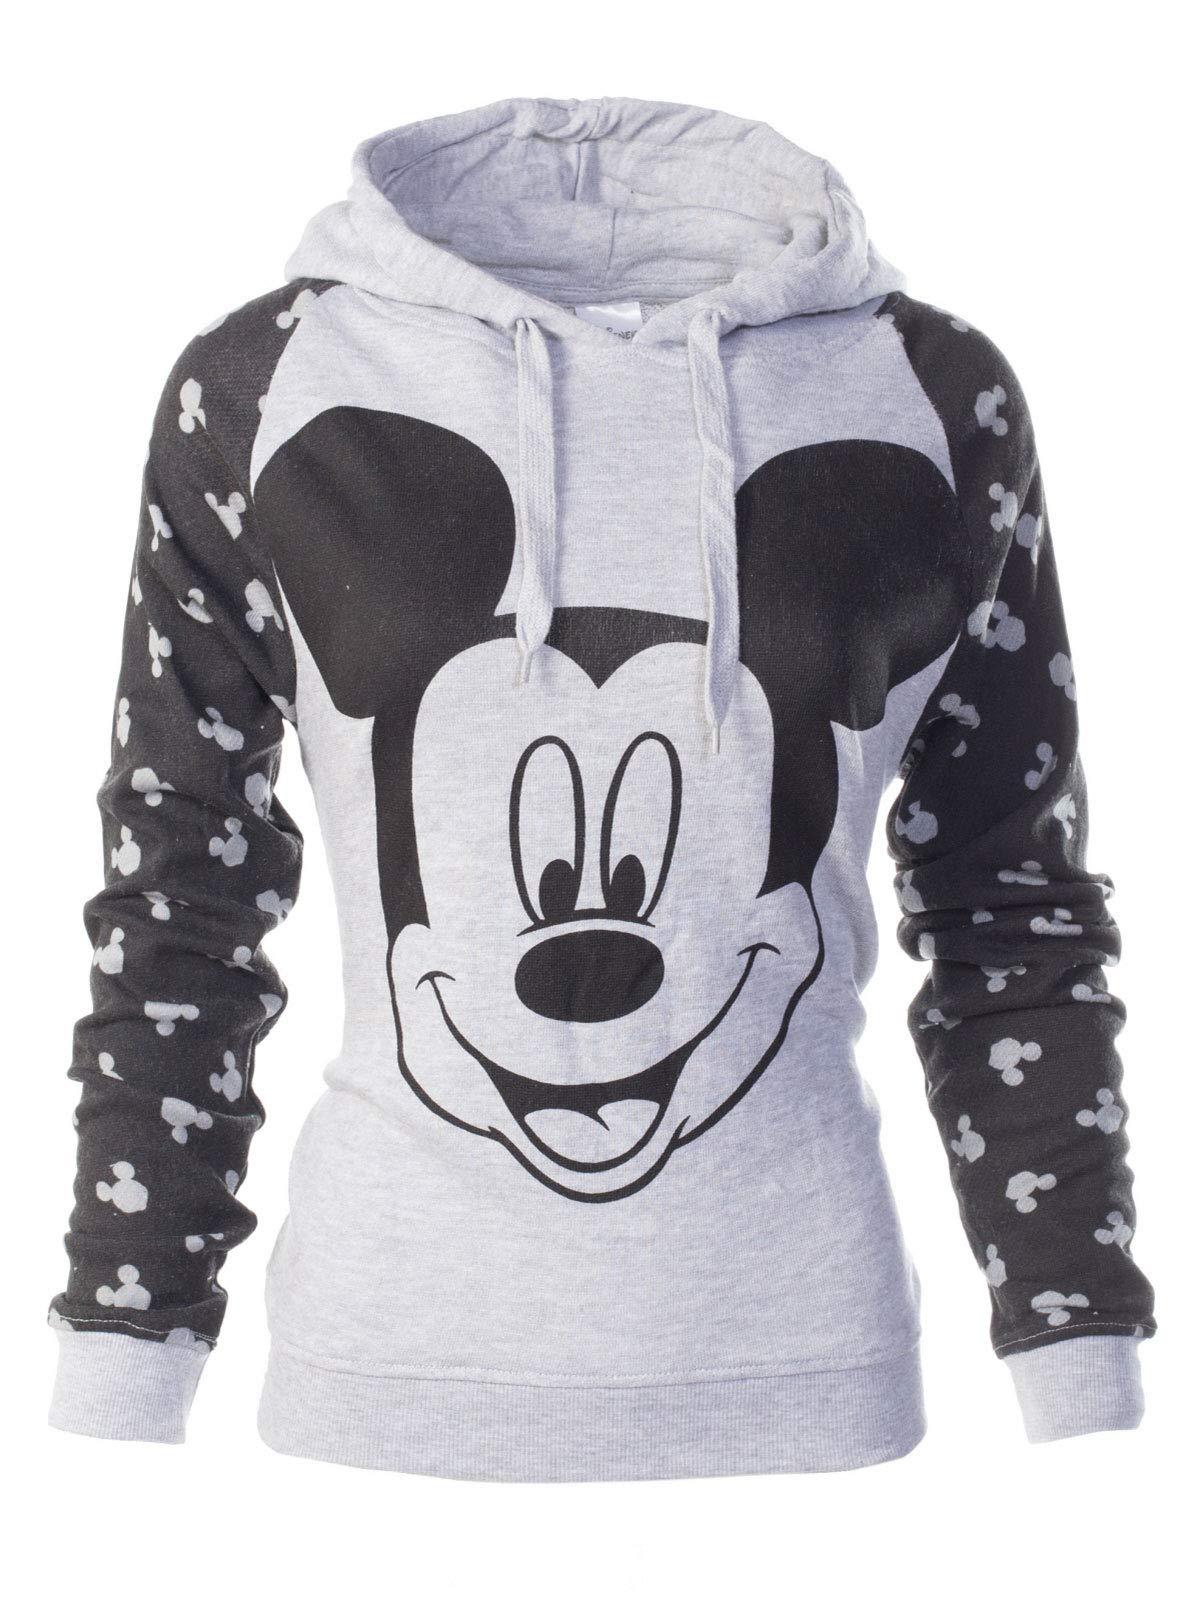 Instar Mode Women's Mickey Face with Black Long Sleeve Hoodie Sweatshirt Heather Grey S